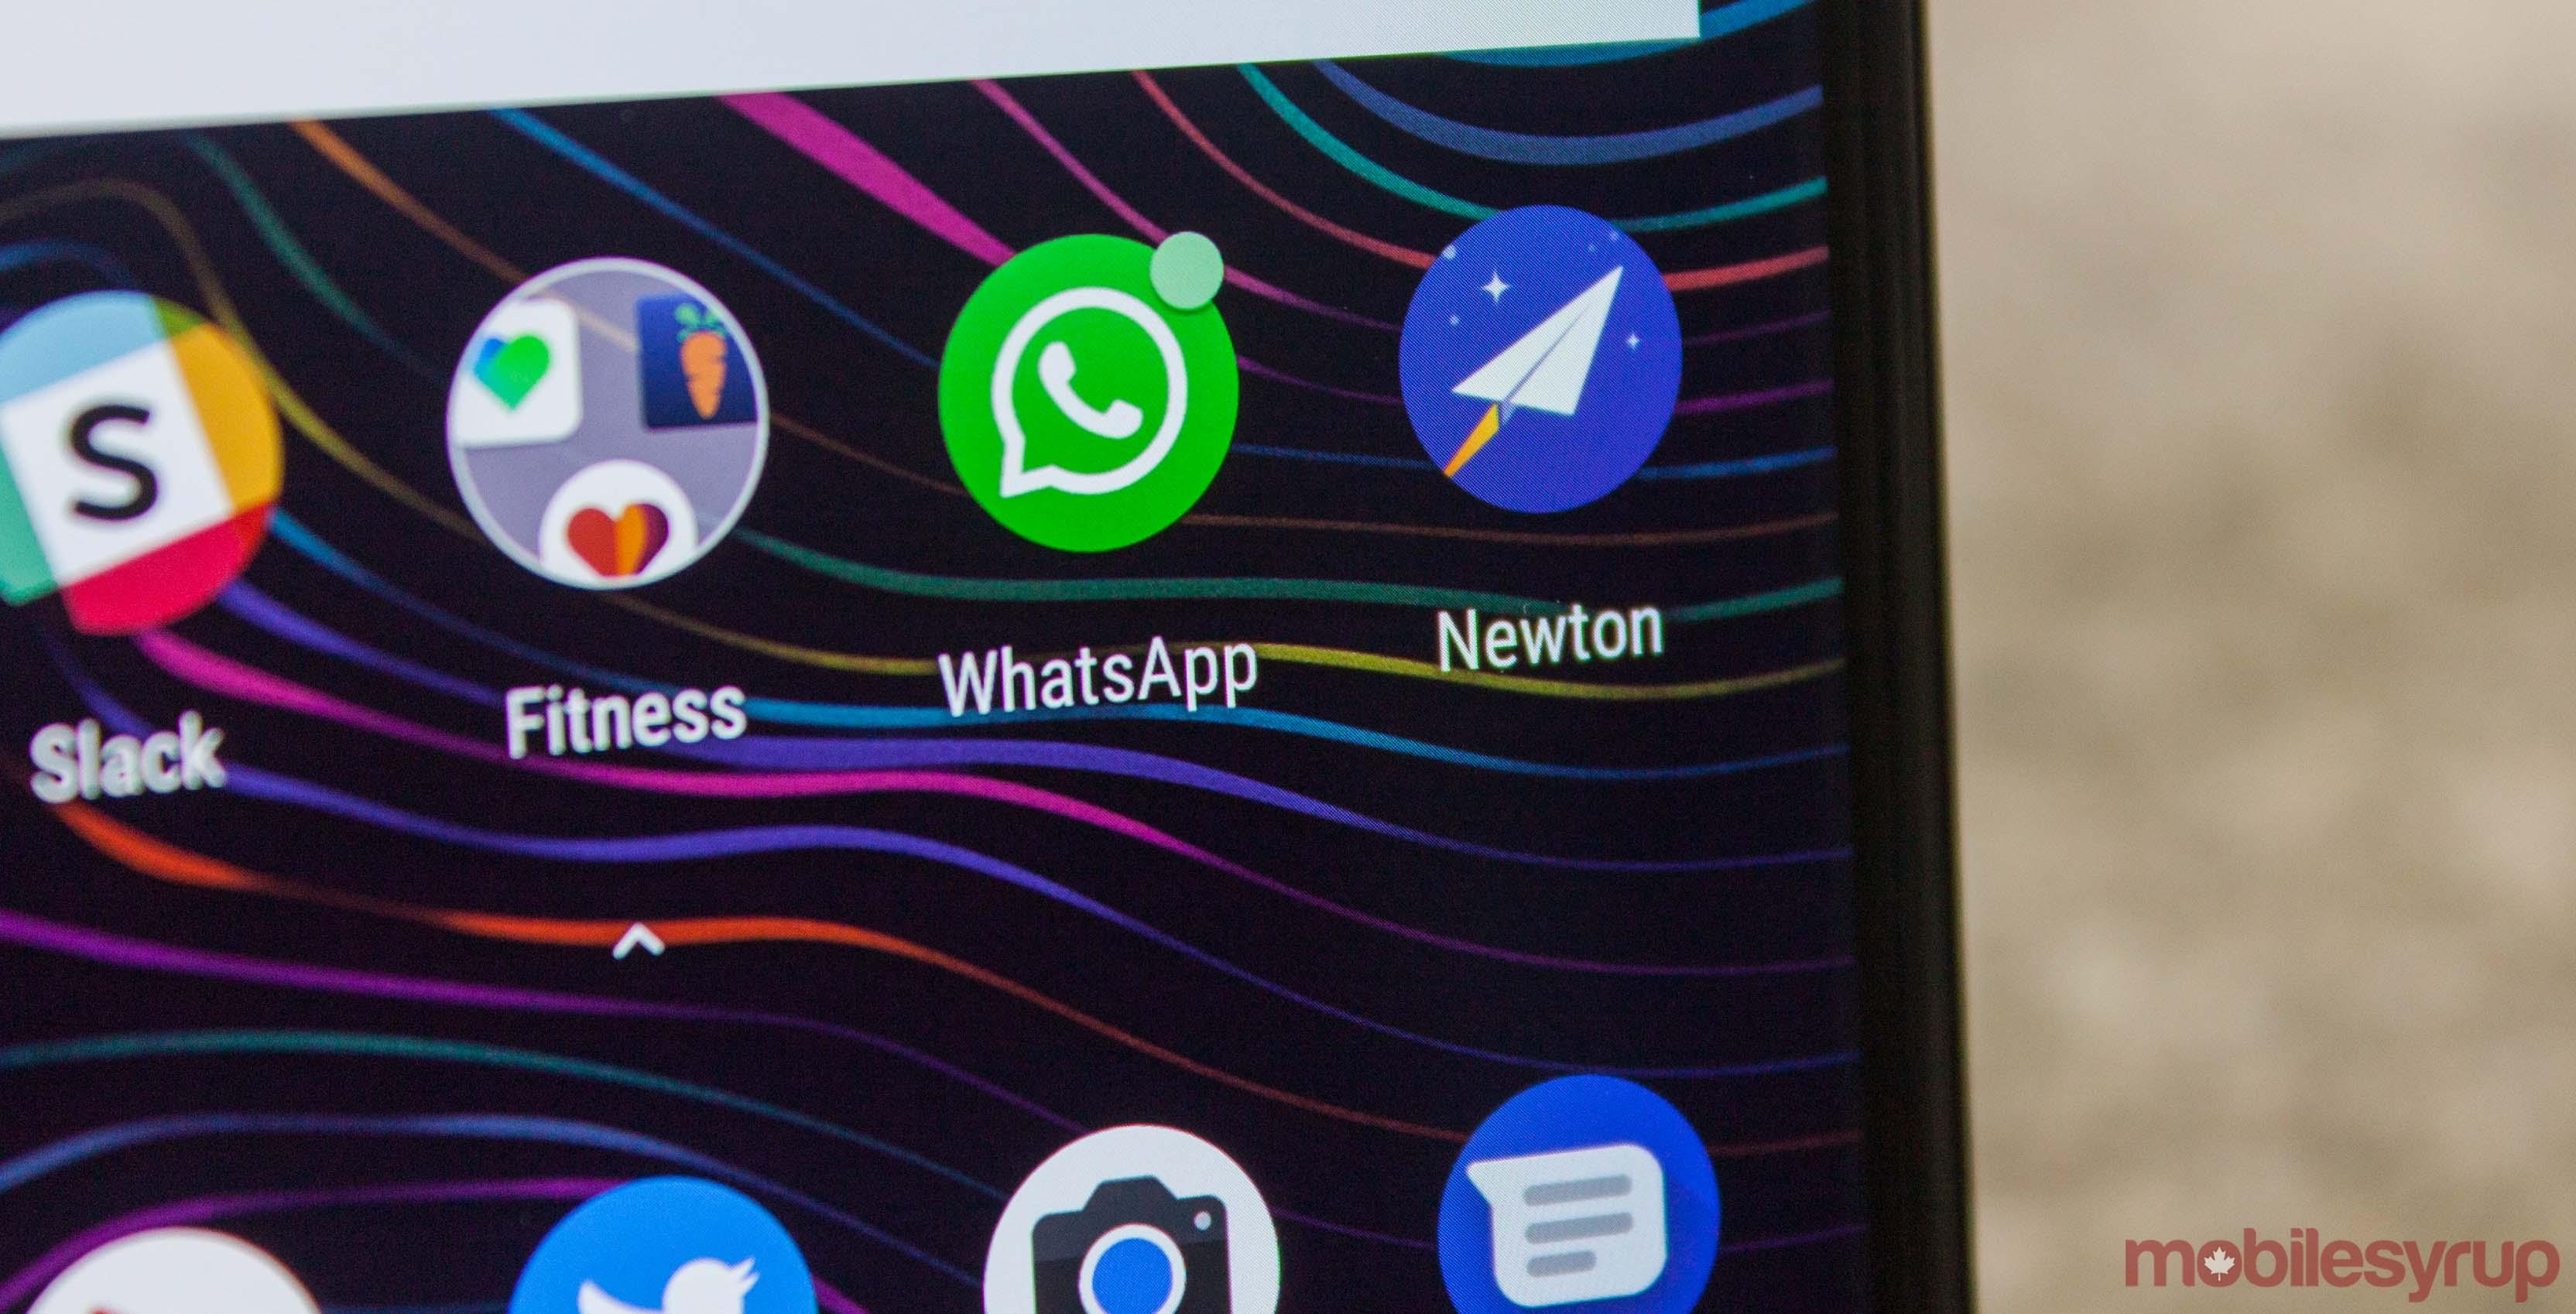 Newton app icon on Android